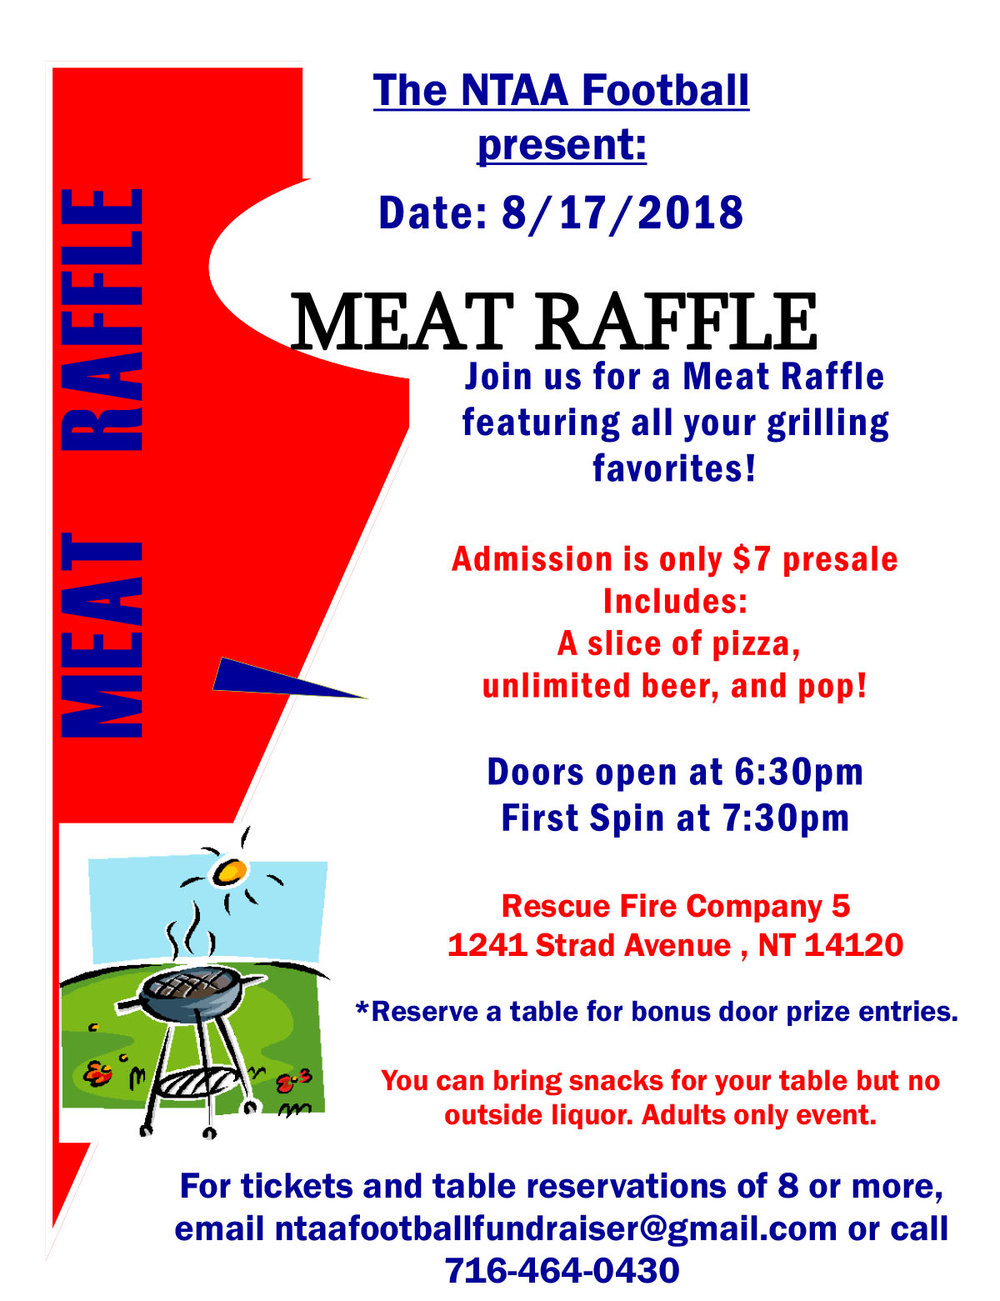 meat raffle poster 18-football.jpg